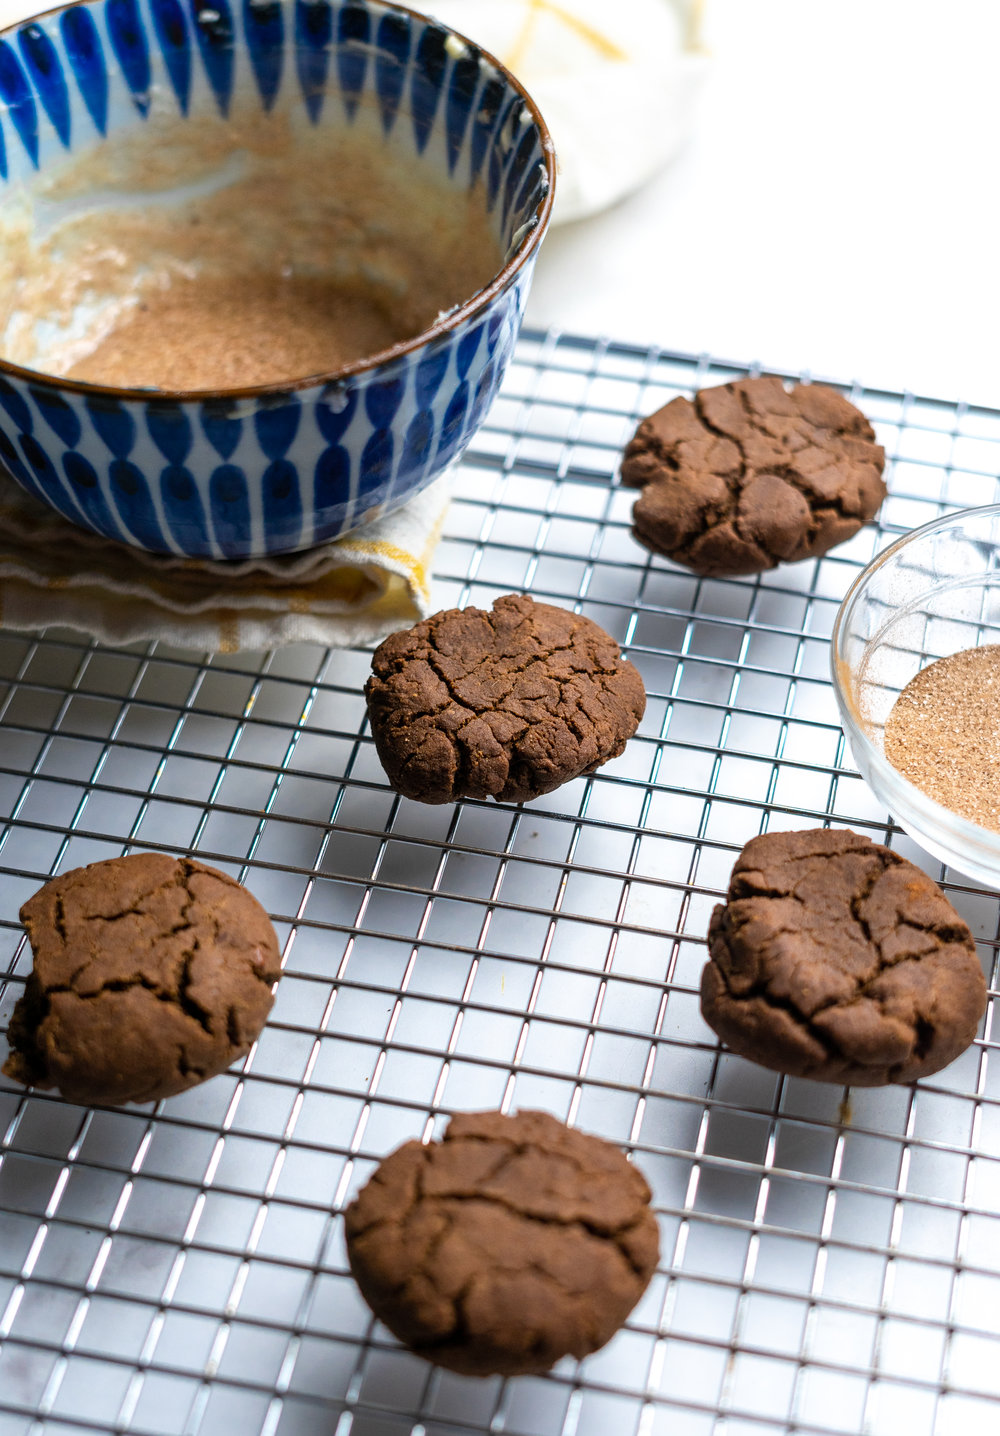 i am rorie, vegan cookie recipe, chocolate molasses cookies, vegan frosting recipe, cinnamon sugar frosting, easy cookie recipe, cookie recipe with standard baking ingredients, vegan baking ideas, chocolate cookies, vegan chocolate cookies, vegan butter, how to make vegan frosting, cocoa powder, holiday cookie recipe, vegan holiday cookie recipe